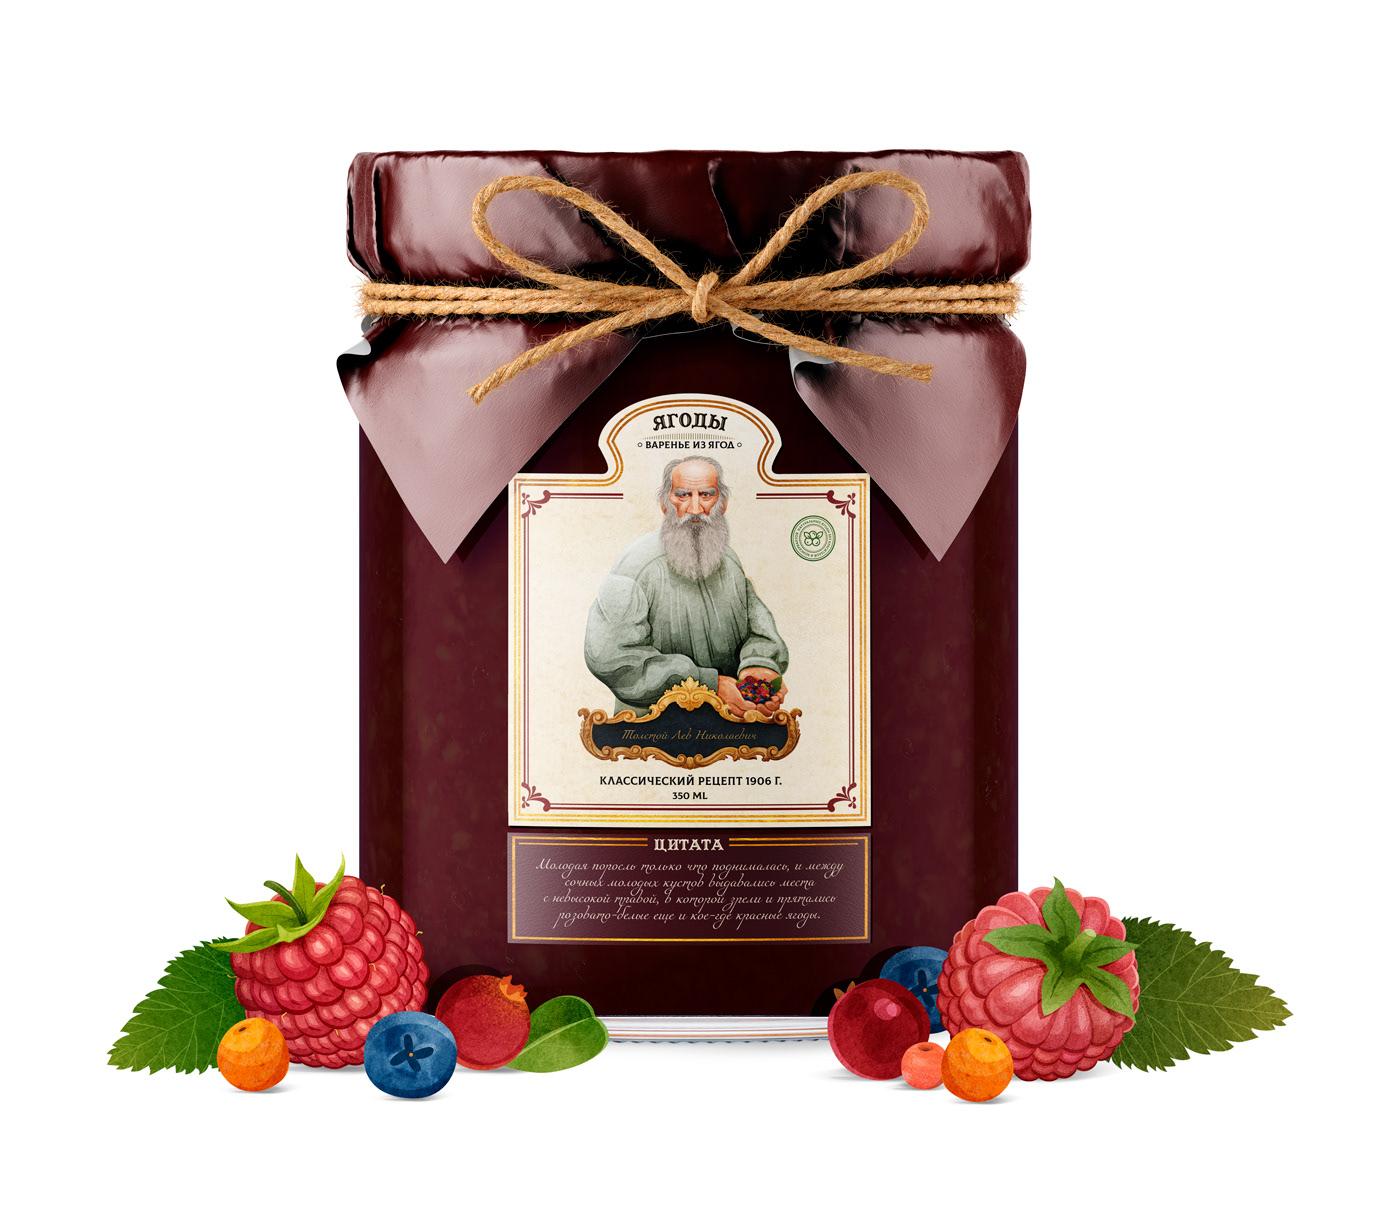 Character design  Food  ILLUSTRATION  jam jar Label Packaging portrait product writers